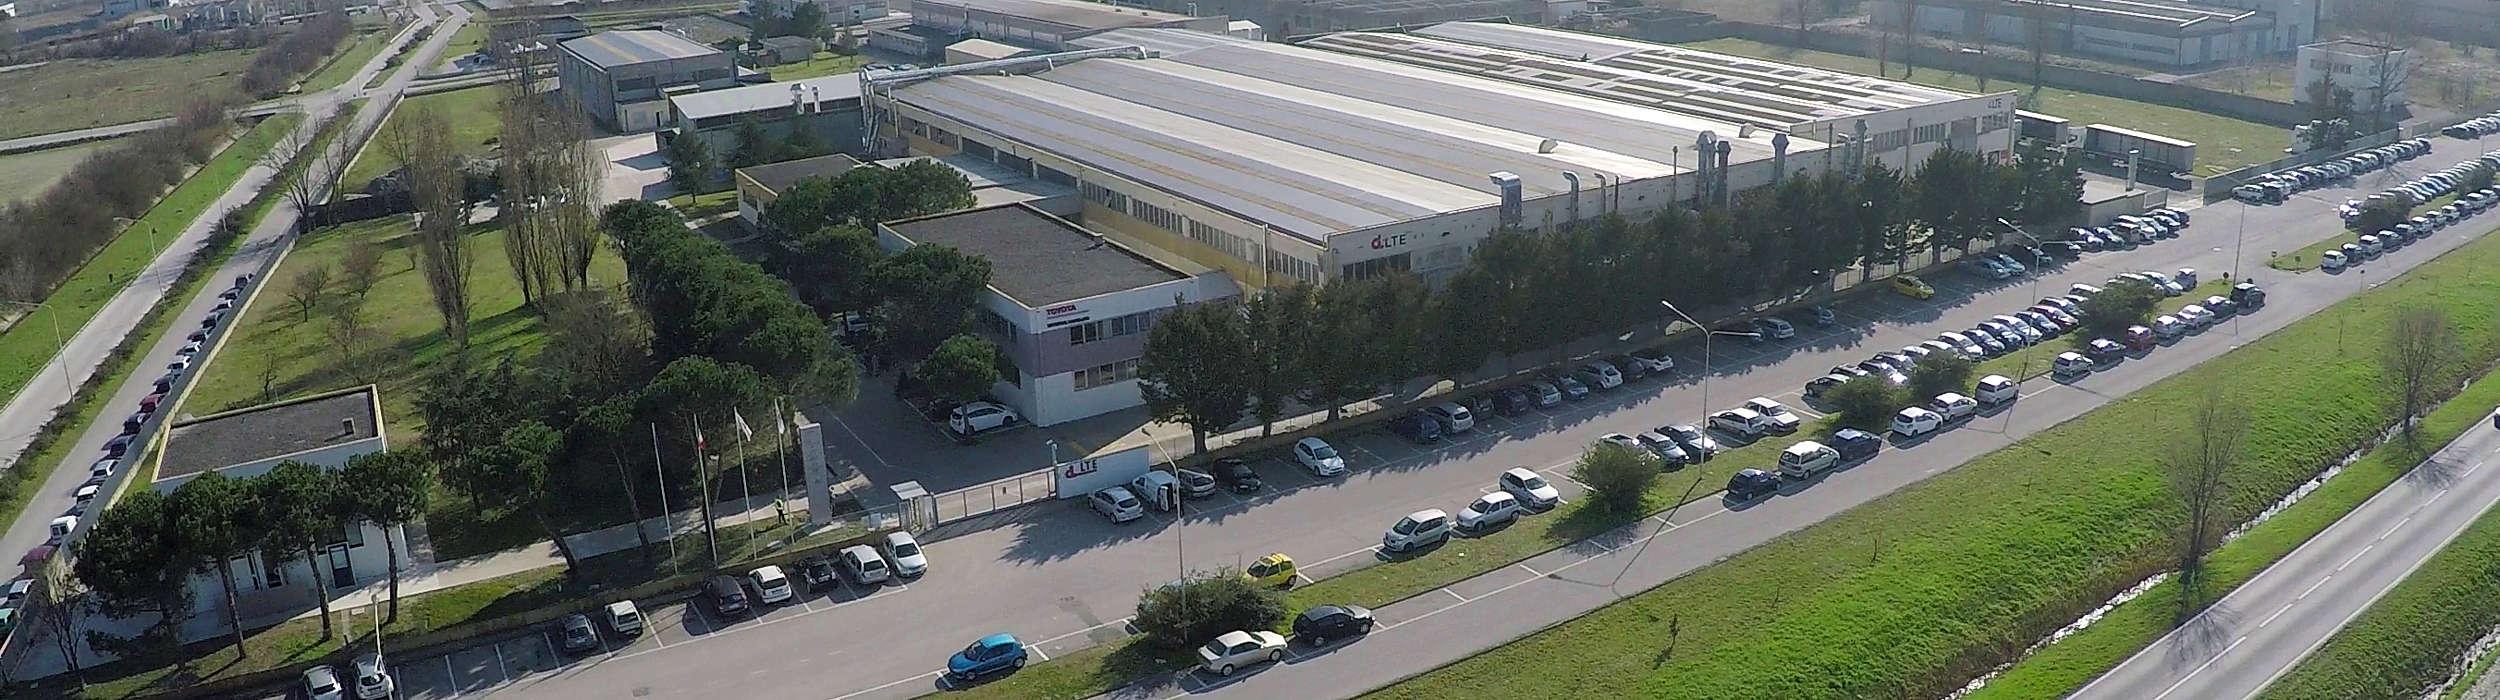 Ferrara factory